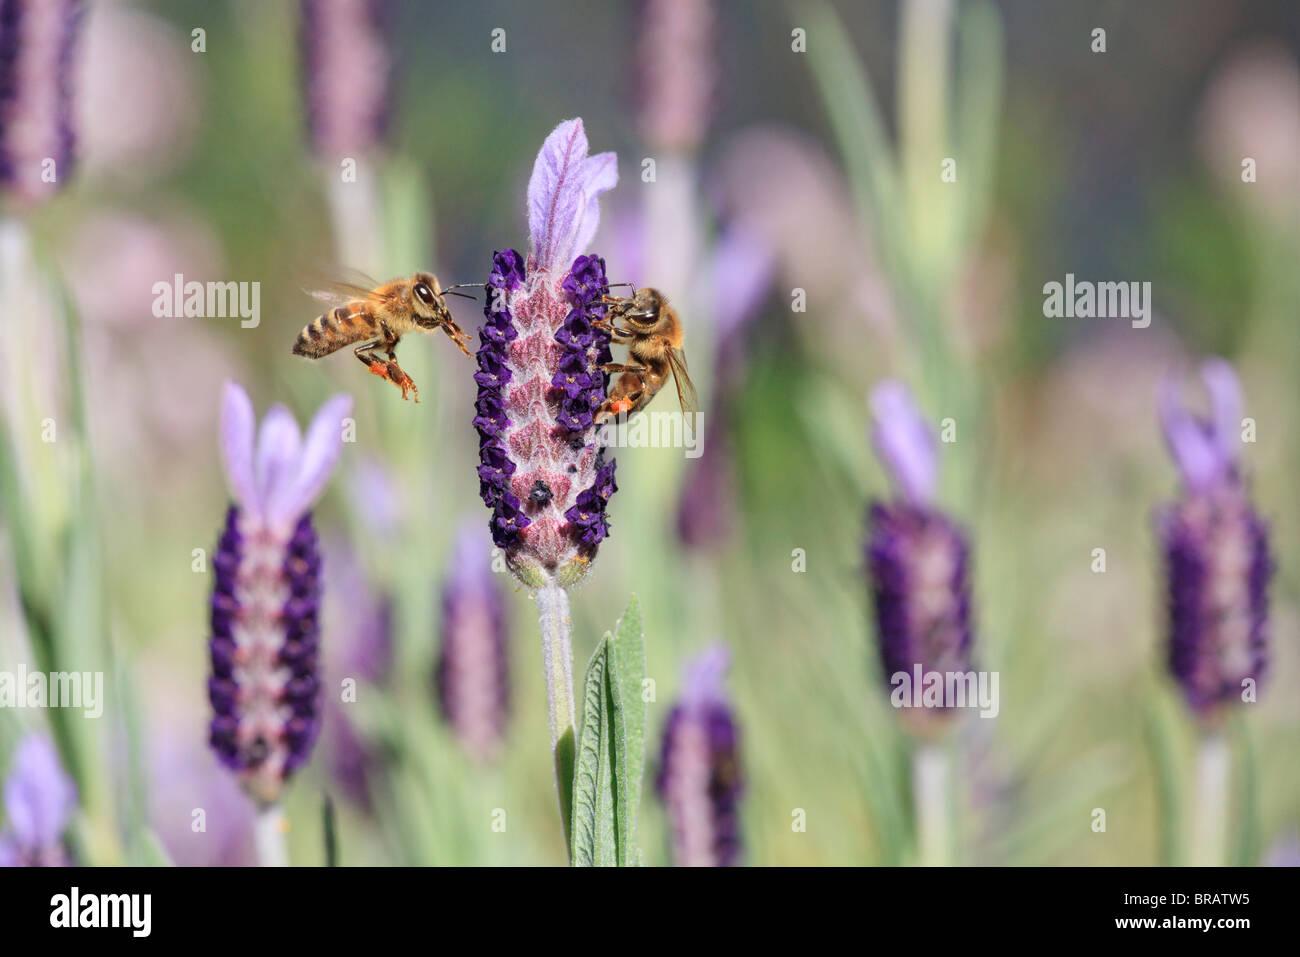 La miel de abeja. Dos abejas de miel Europeas ( Apis mellifera ) en una flor de lavanda francesa ( Lavandula stoechas ). También conocida como La Abeja de Miel occidental. Foto de stock